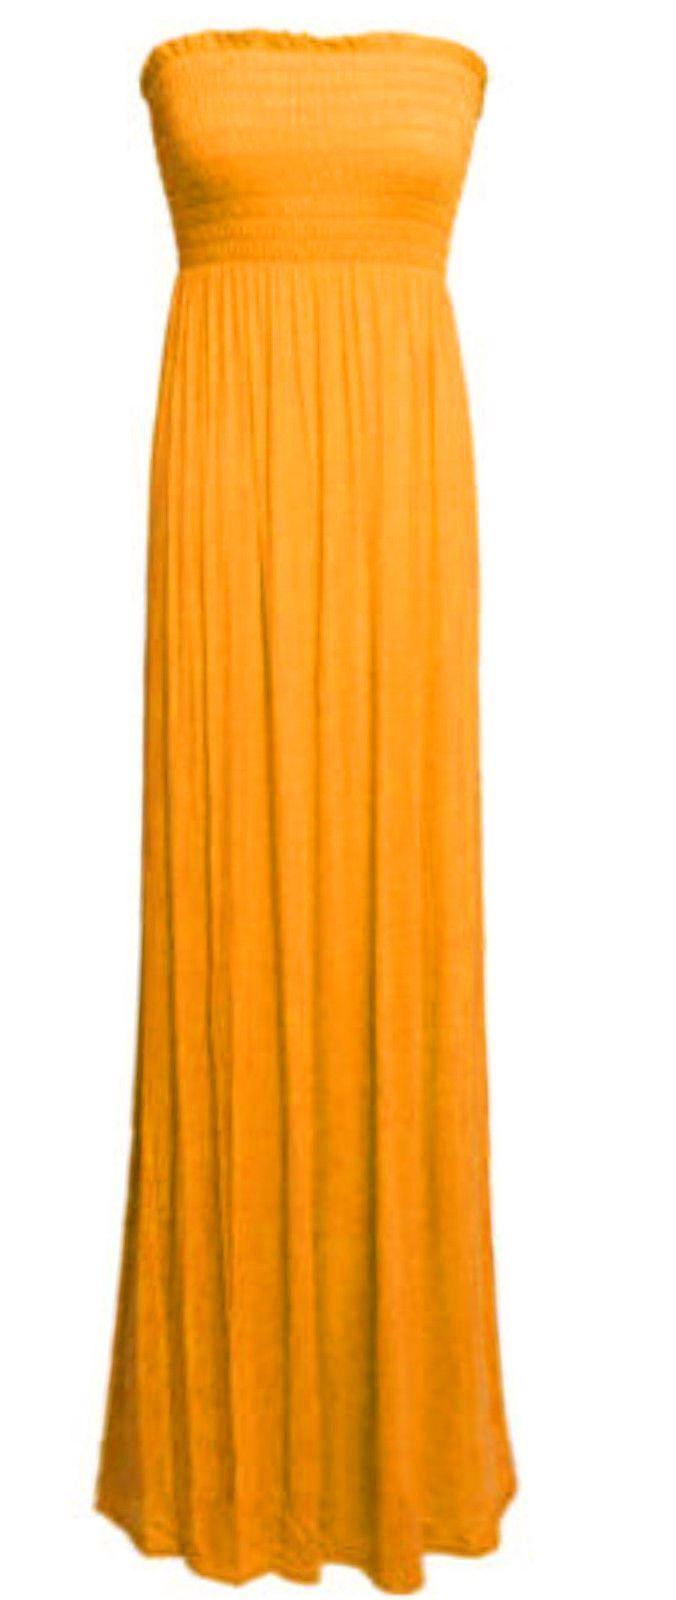 New-Womens-Sleeveless-Boobtube-Bandeau-Maxi-Ladies-Sheering-Long-Dress-Size-8-26 thumbnail 24